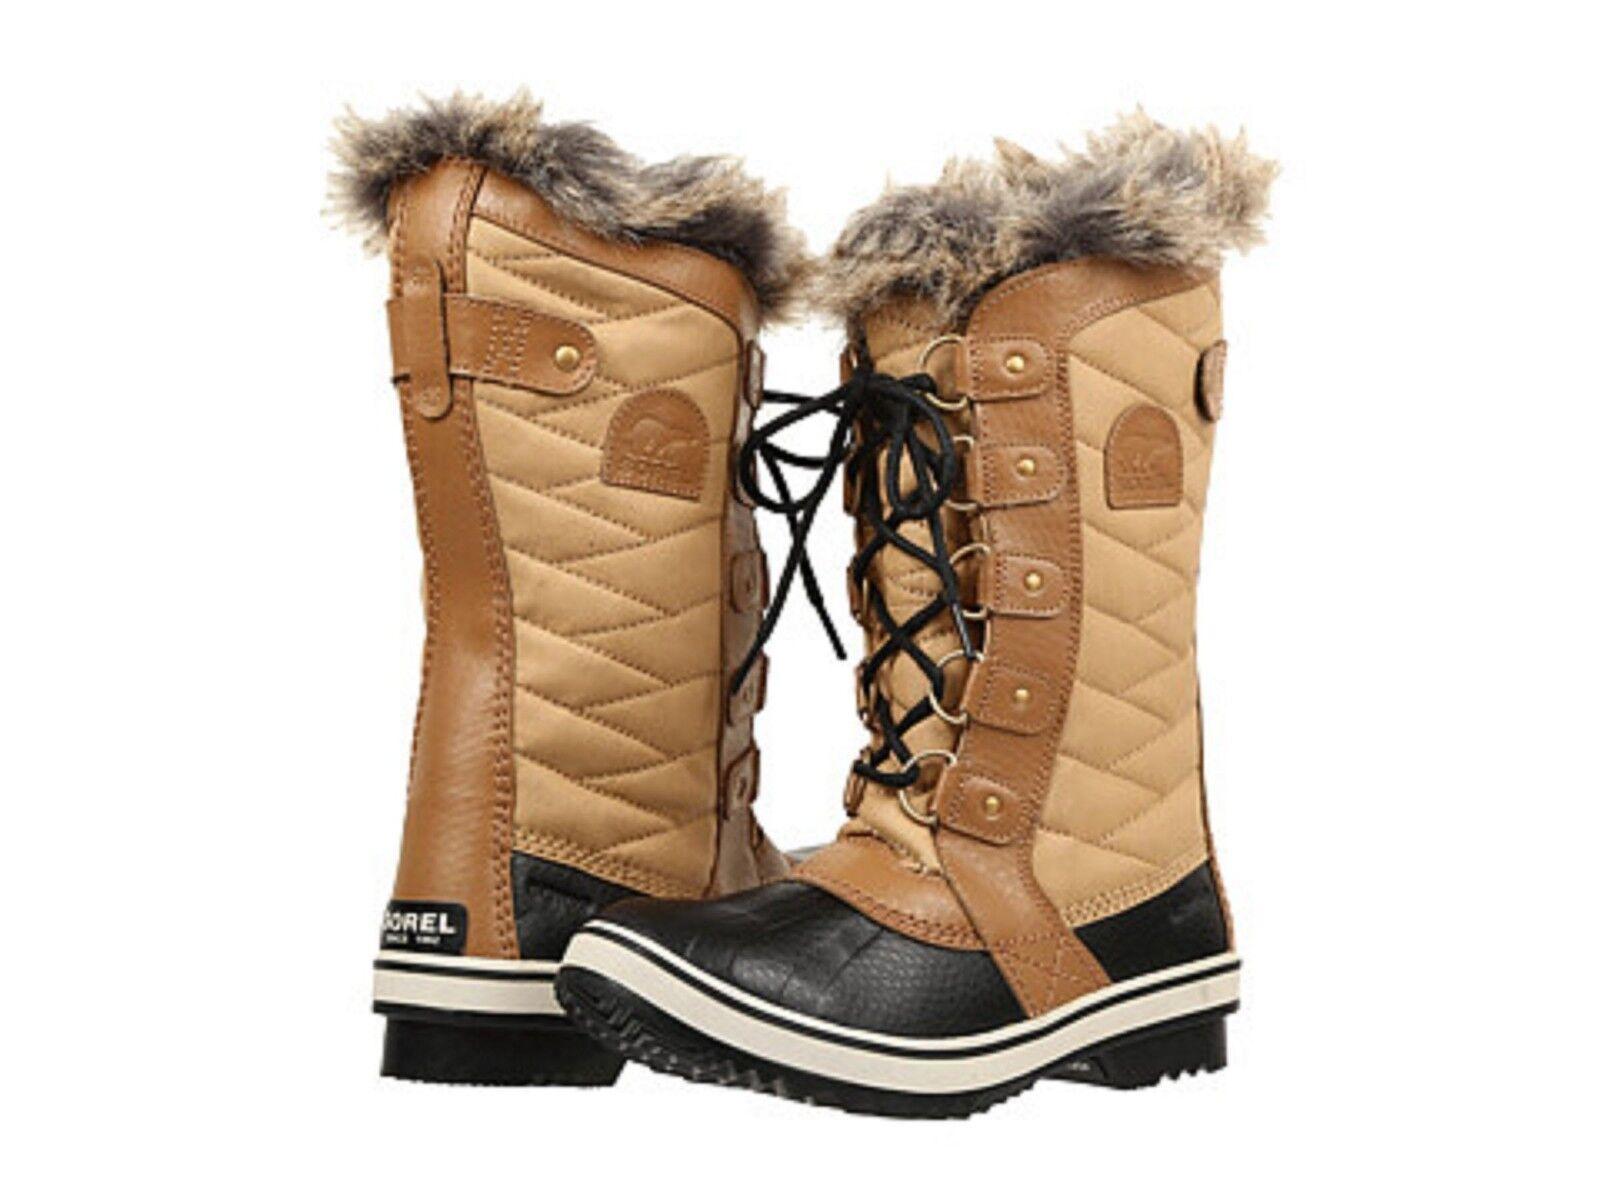 NIB SOREL WO Herren TOFINO SNOW II LACE Curry, Fawn SNOW TOFINO WINTER Stiefel WATERPROOF *NEW* ef85f5